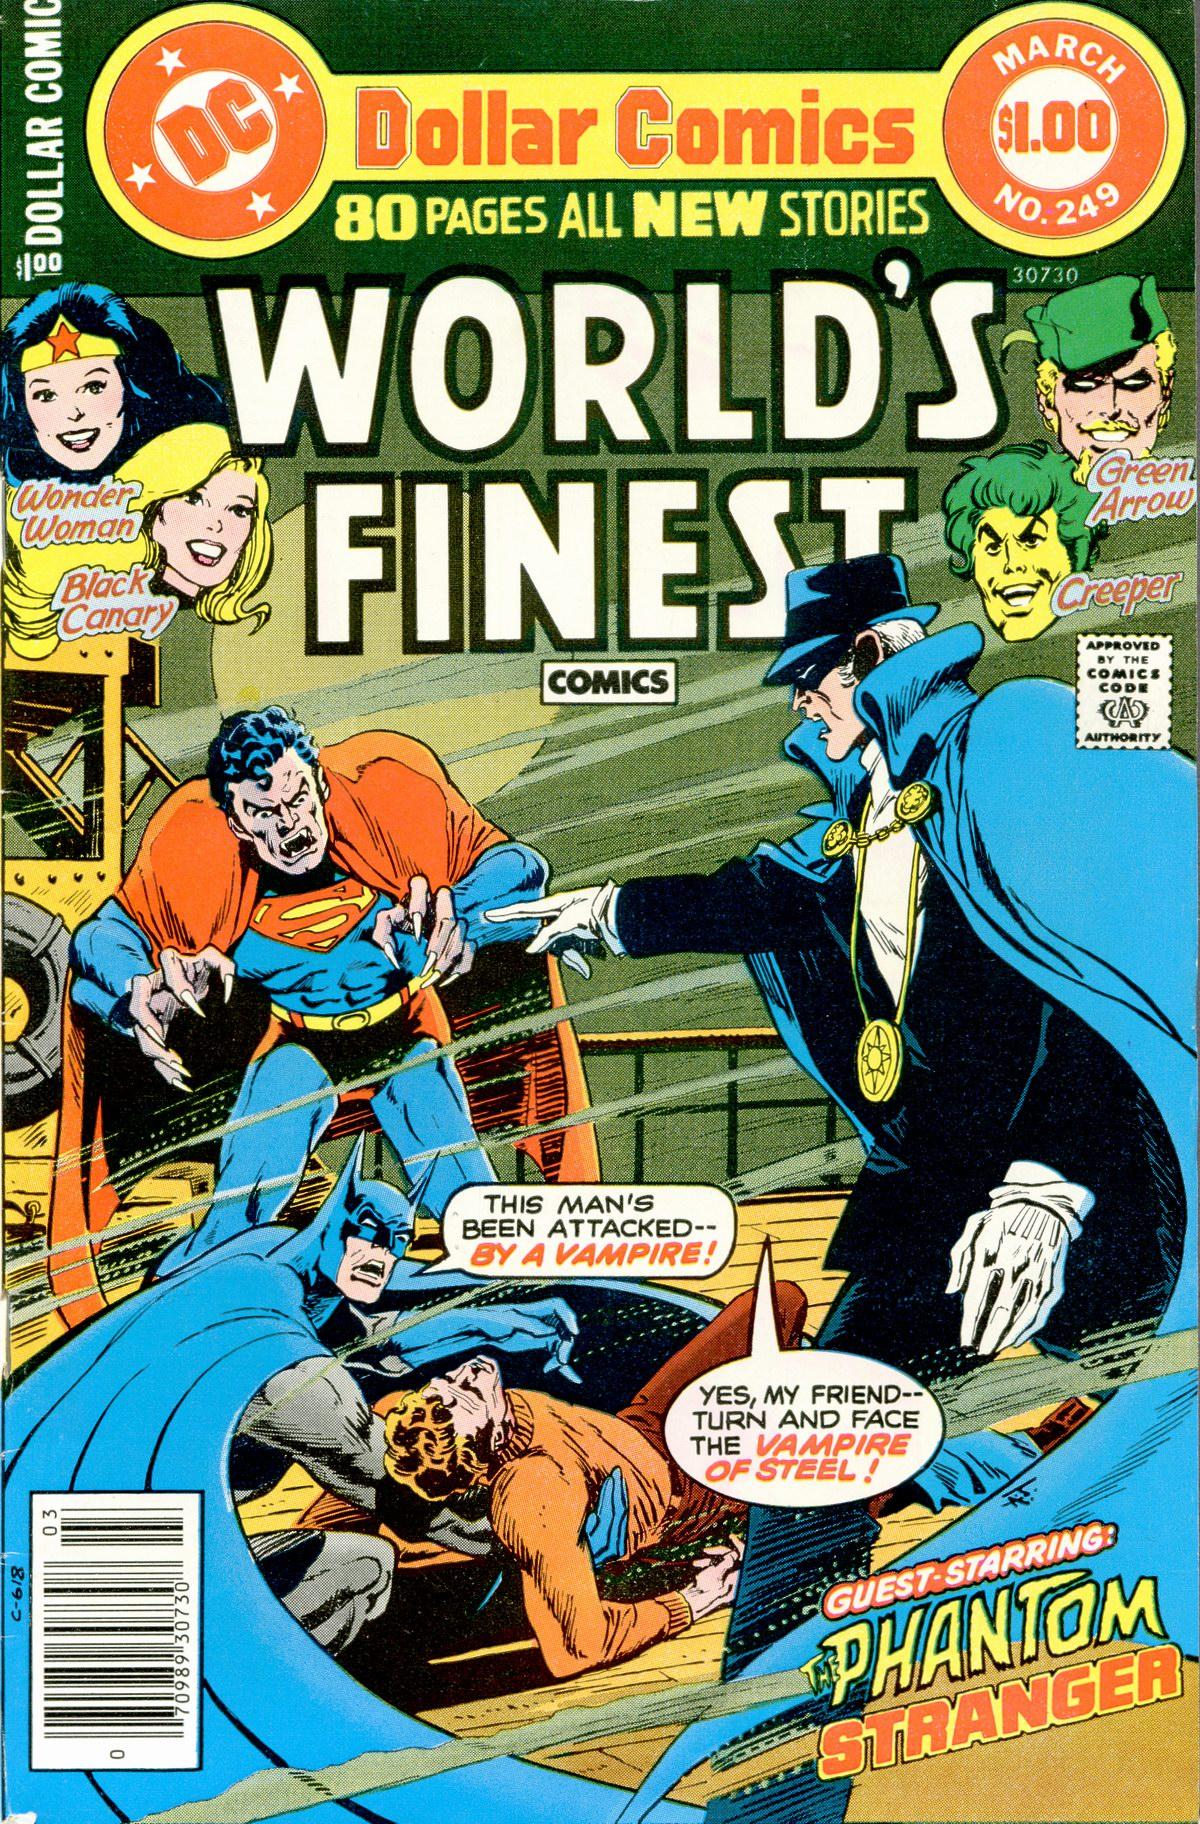 Read online World's Finest Comics comic -  Issue #249 - 1